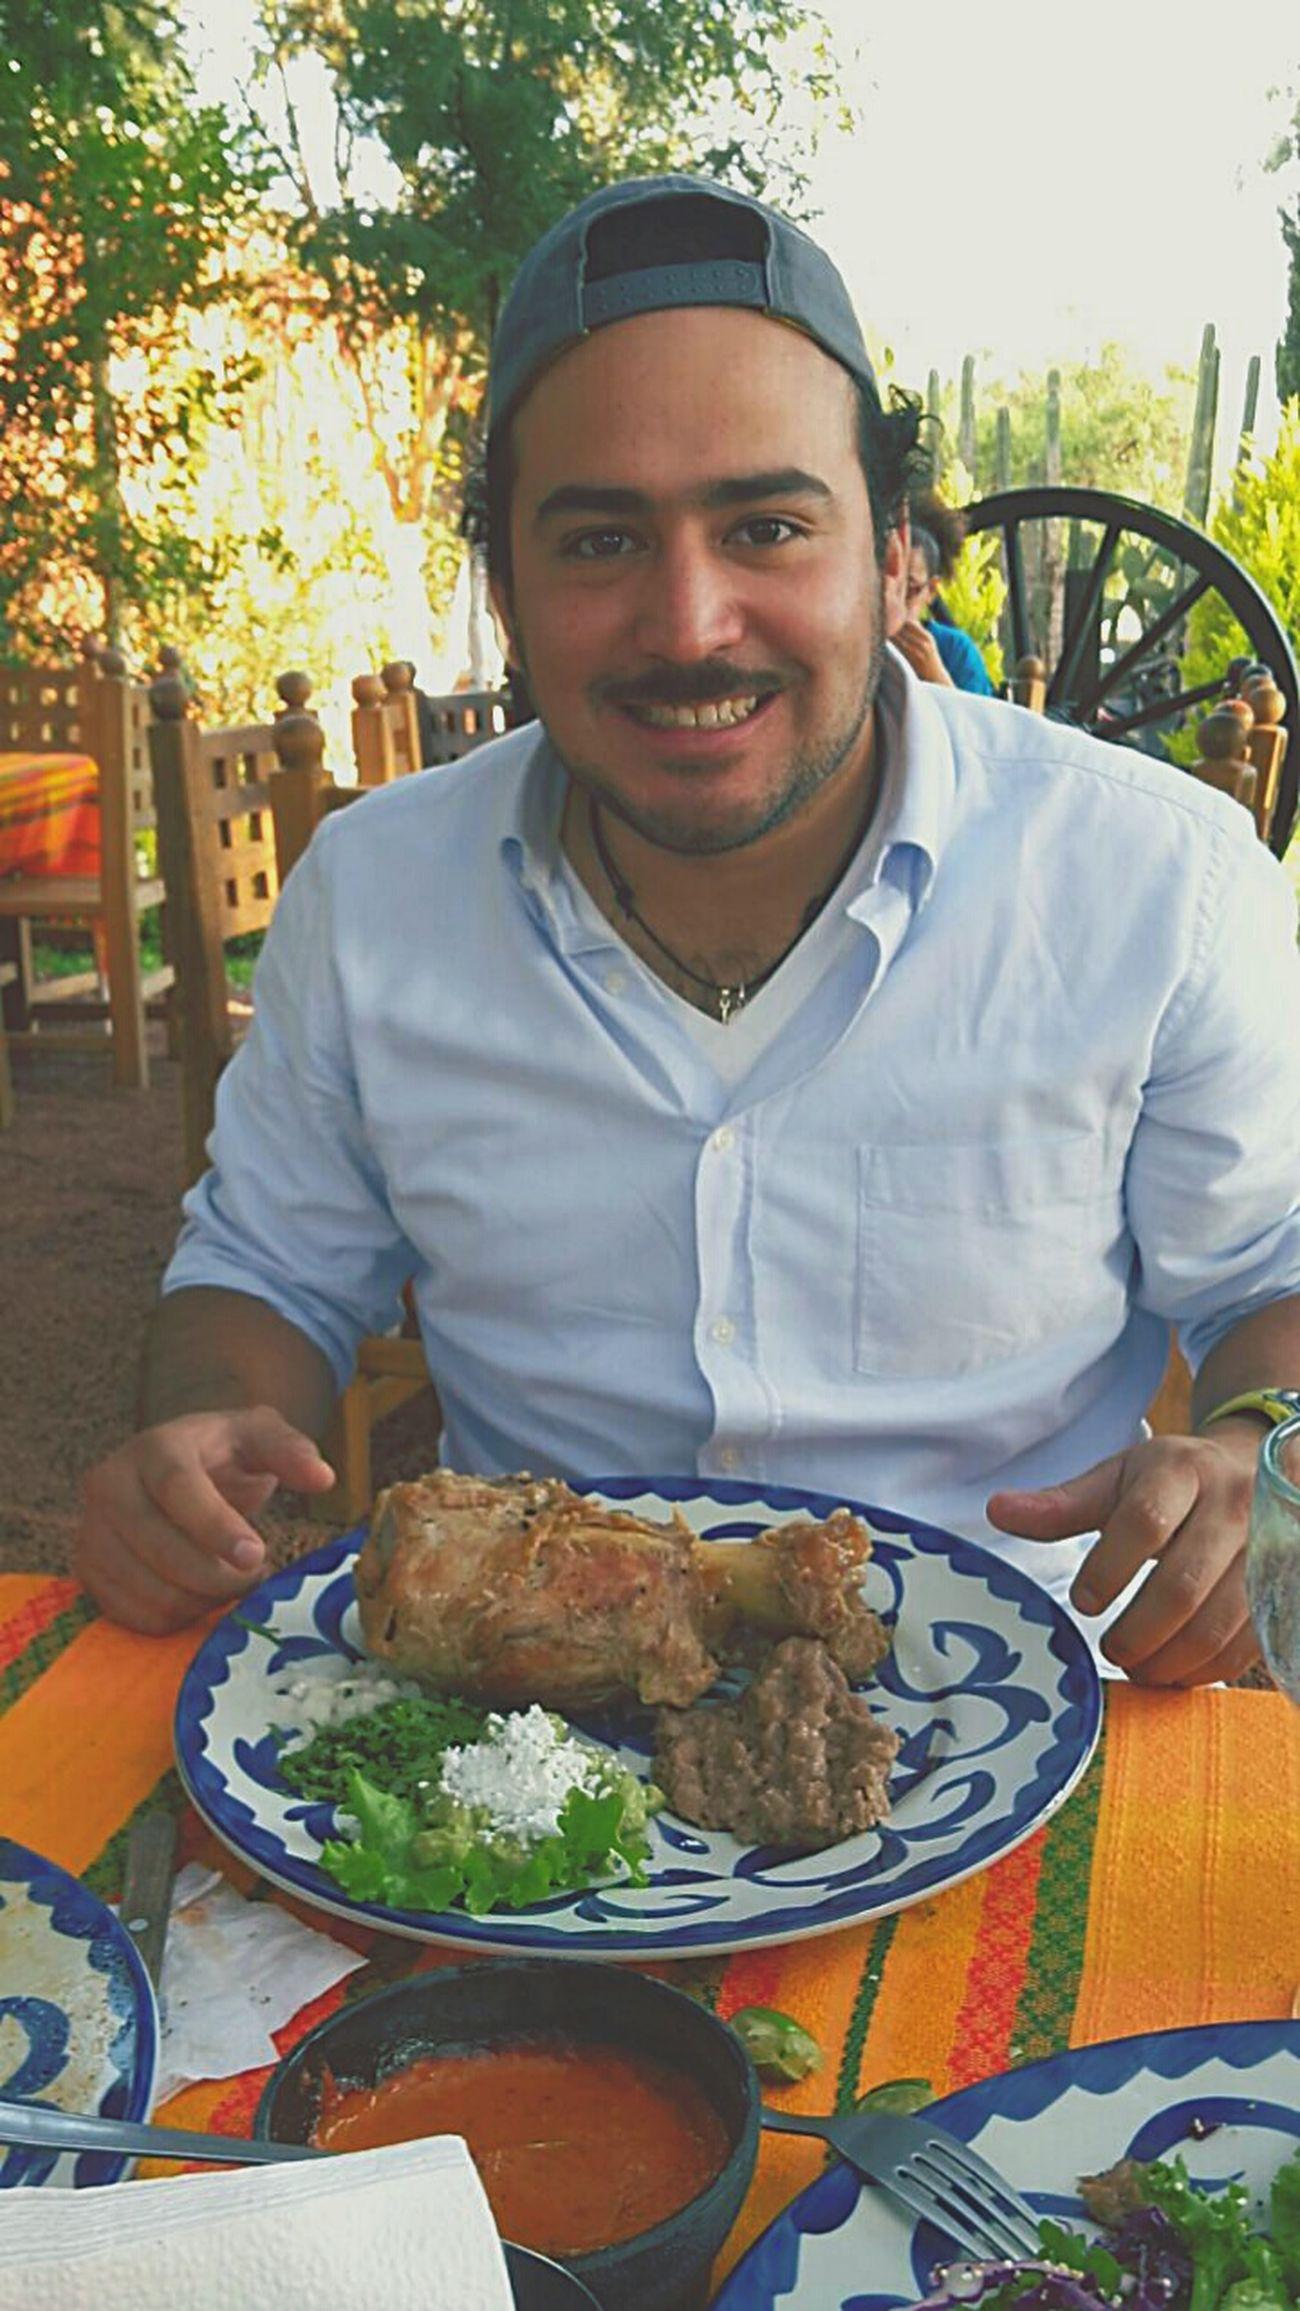 Teotihuacan Mexico Chamorro👊 Foodporn Me